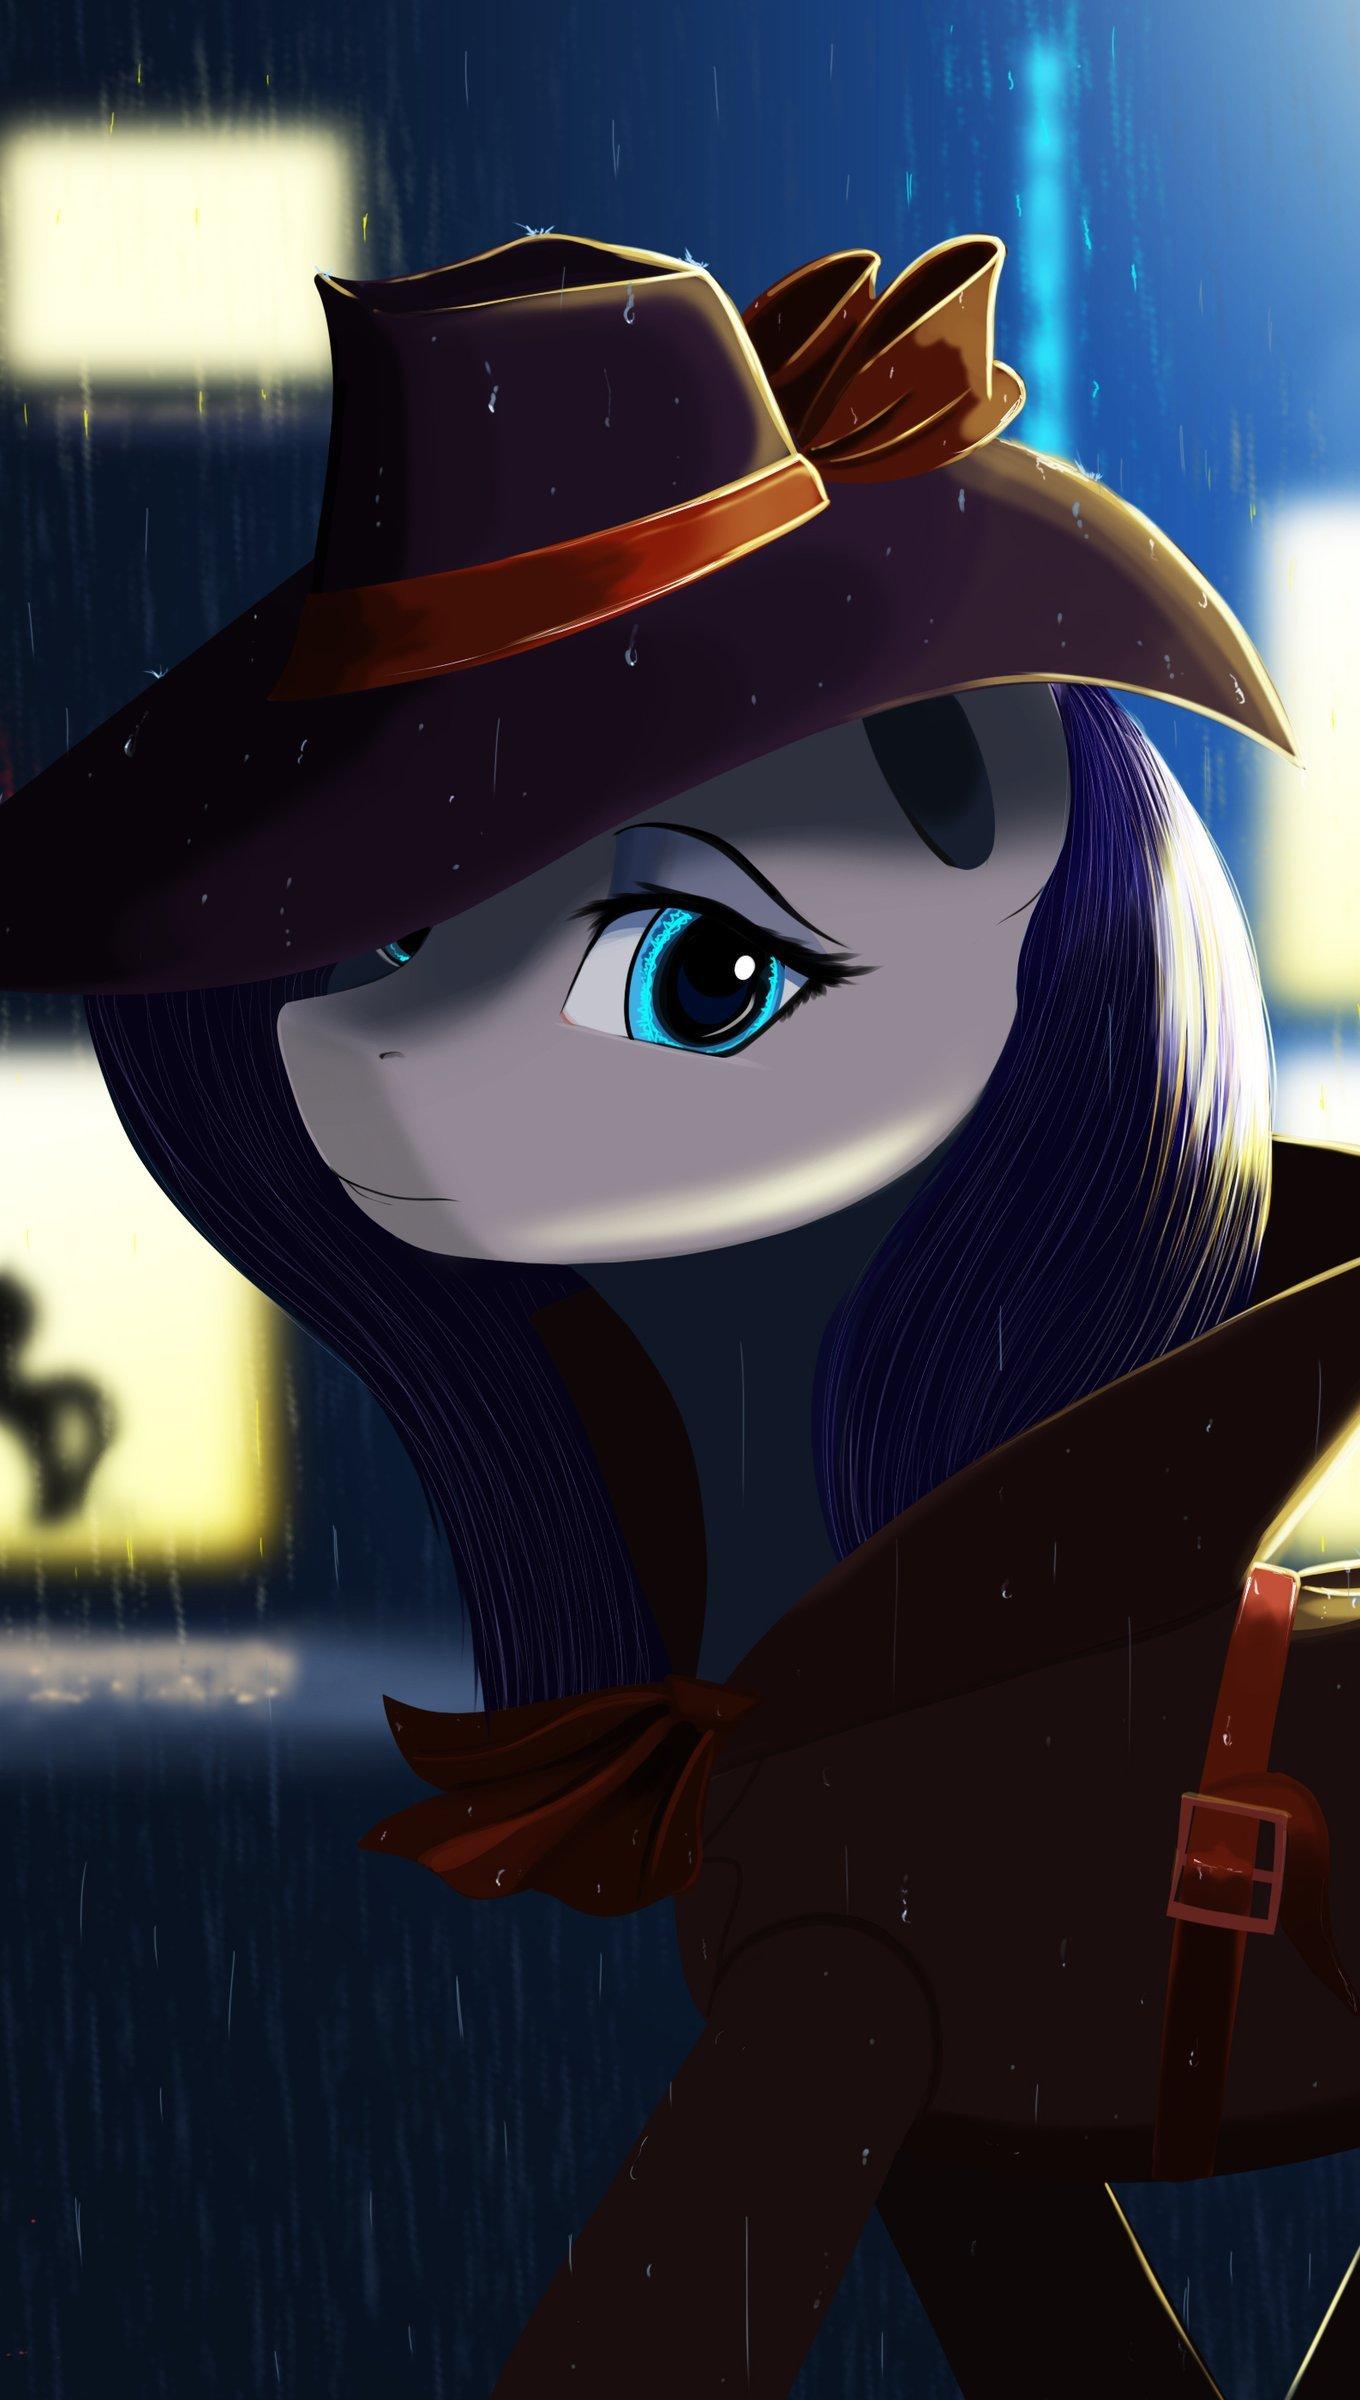 Fondos de pantalla Pequeño Pony Detective Vertical